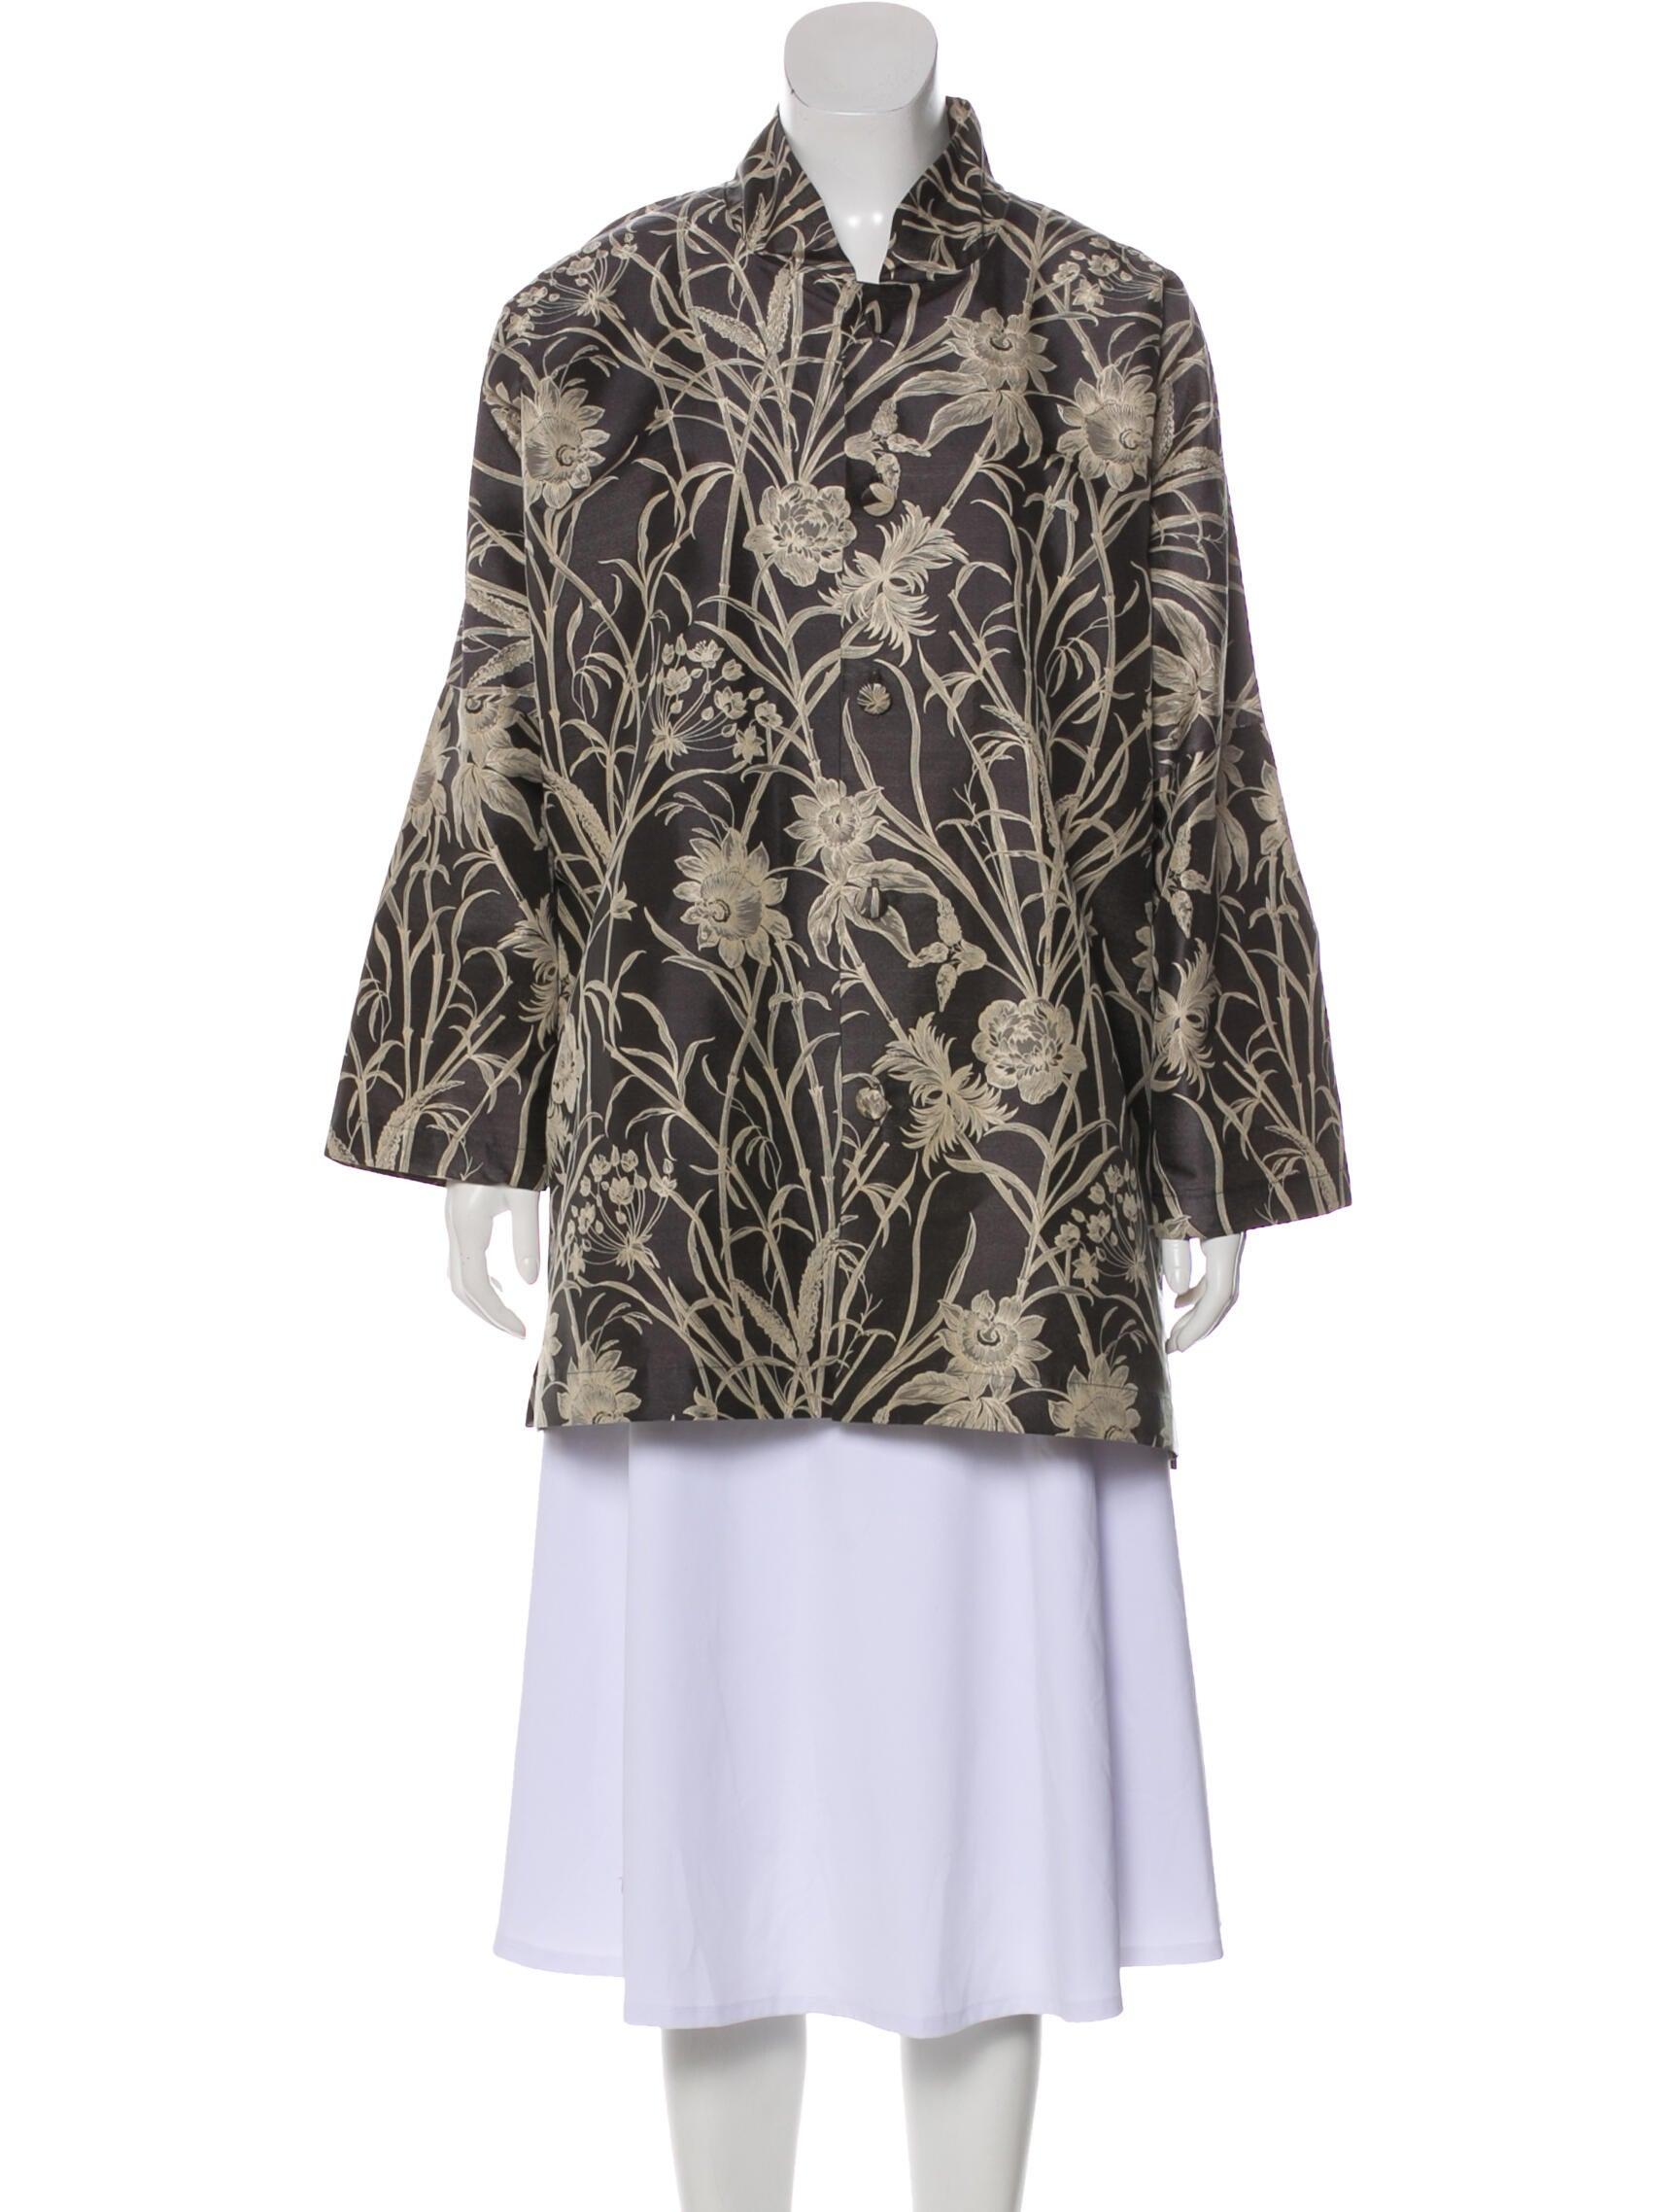 Eskandar Floral Print Jacket - Clothing -           ESK33613 | The RealReal